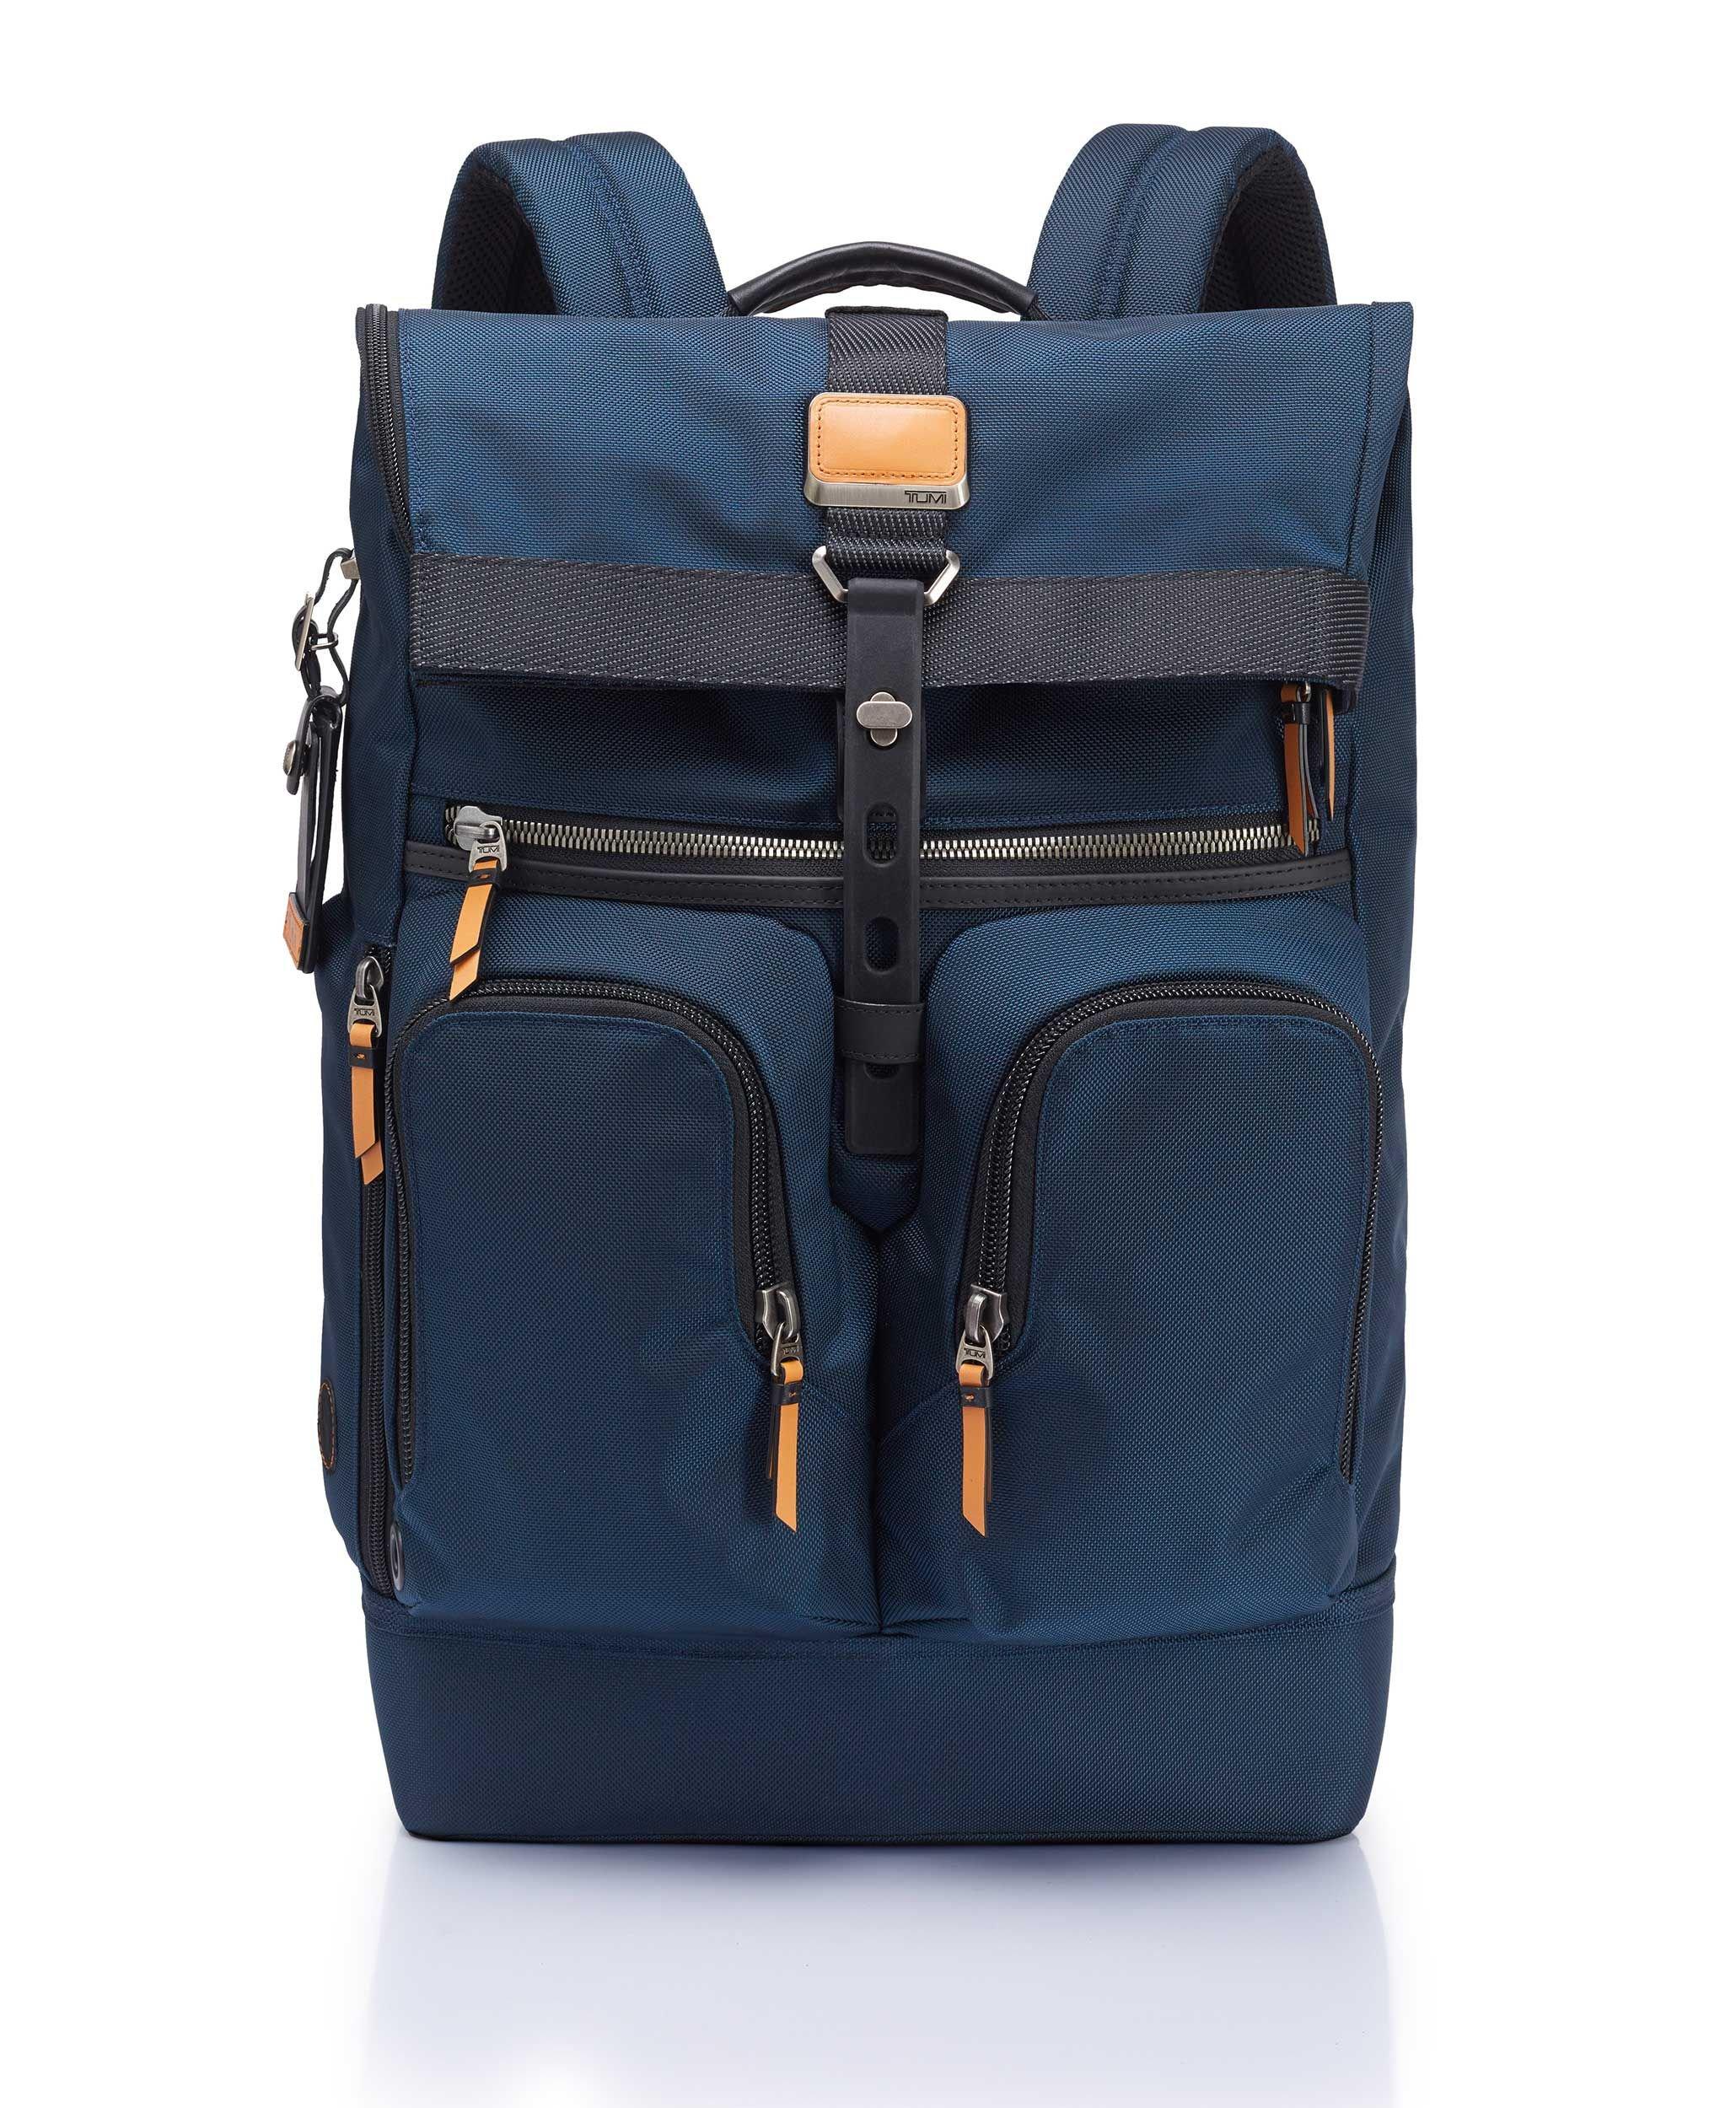 b3a54c66b2f1 London Roll-Top Backpack